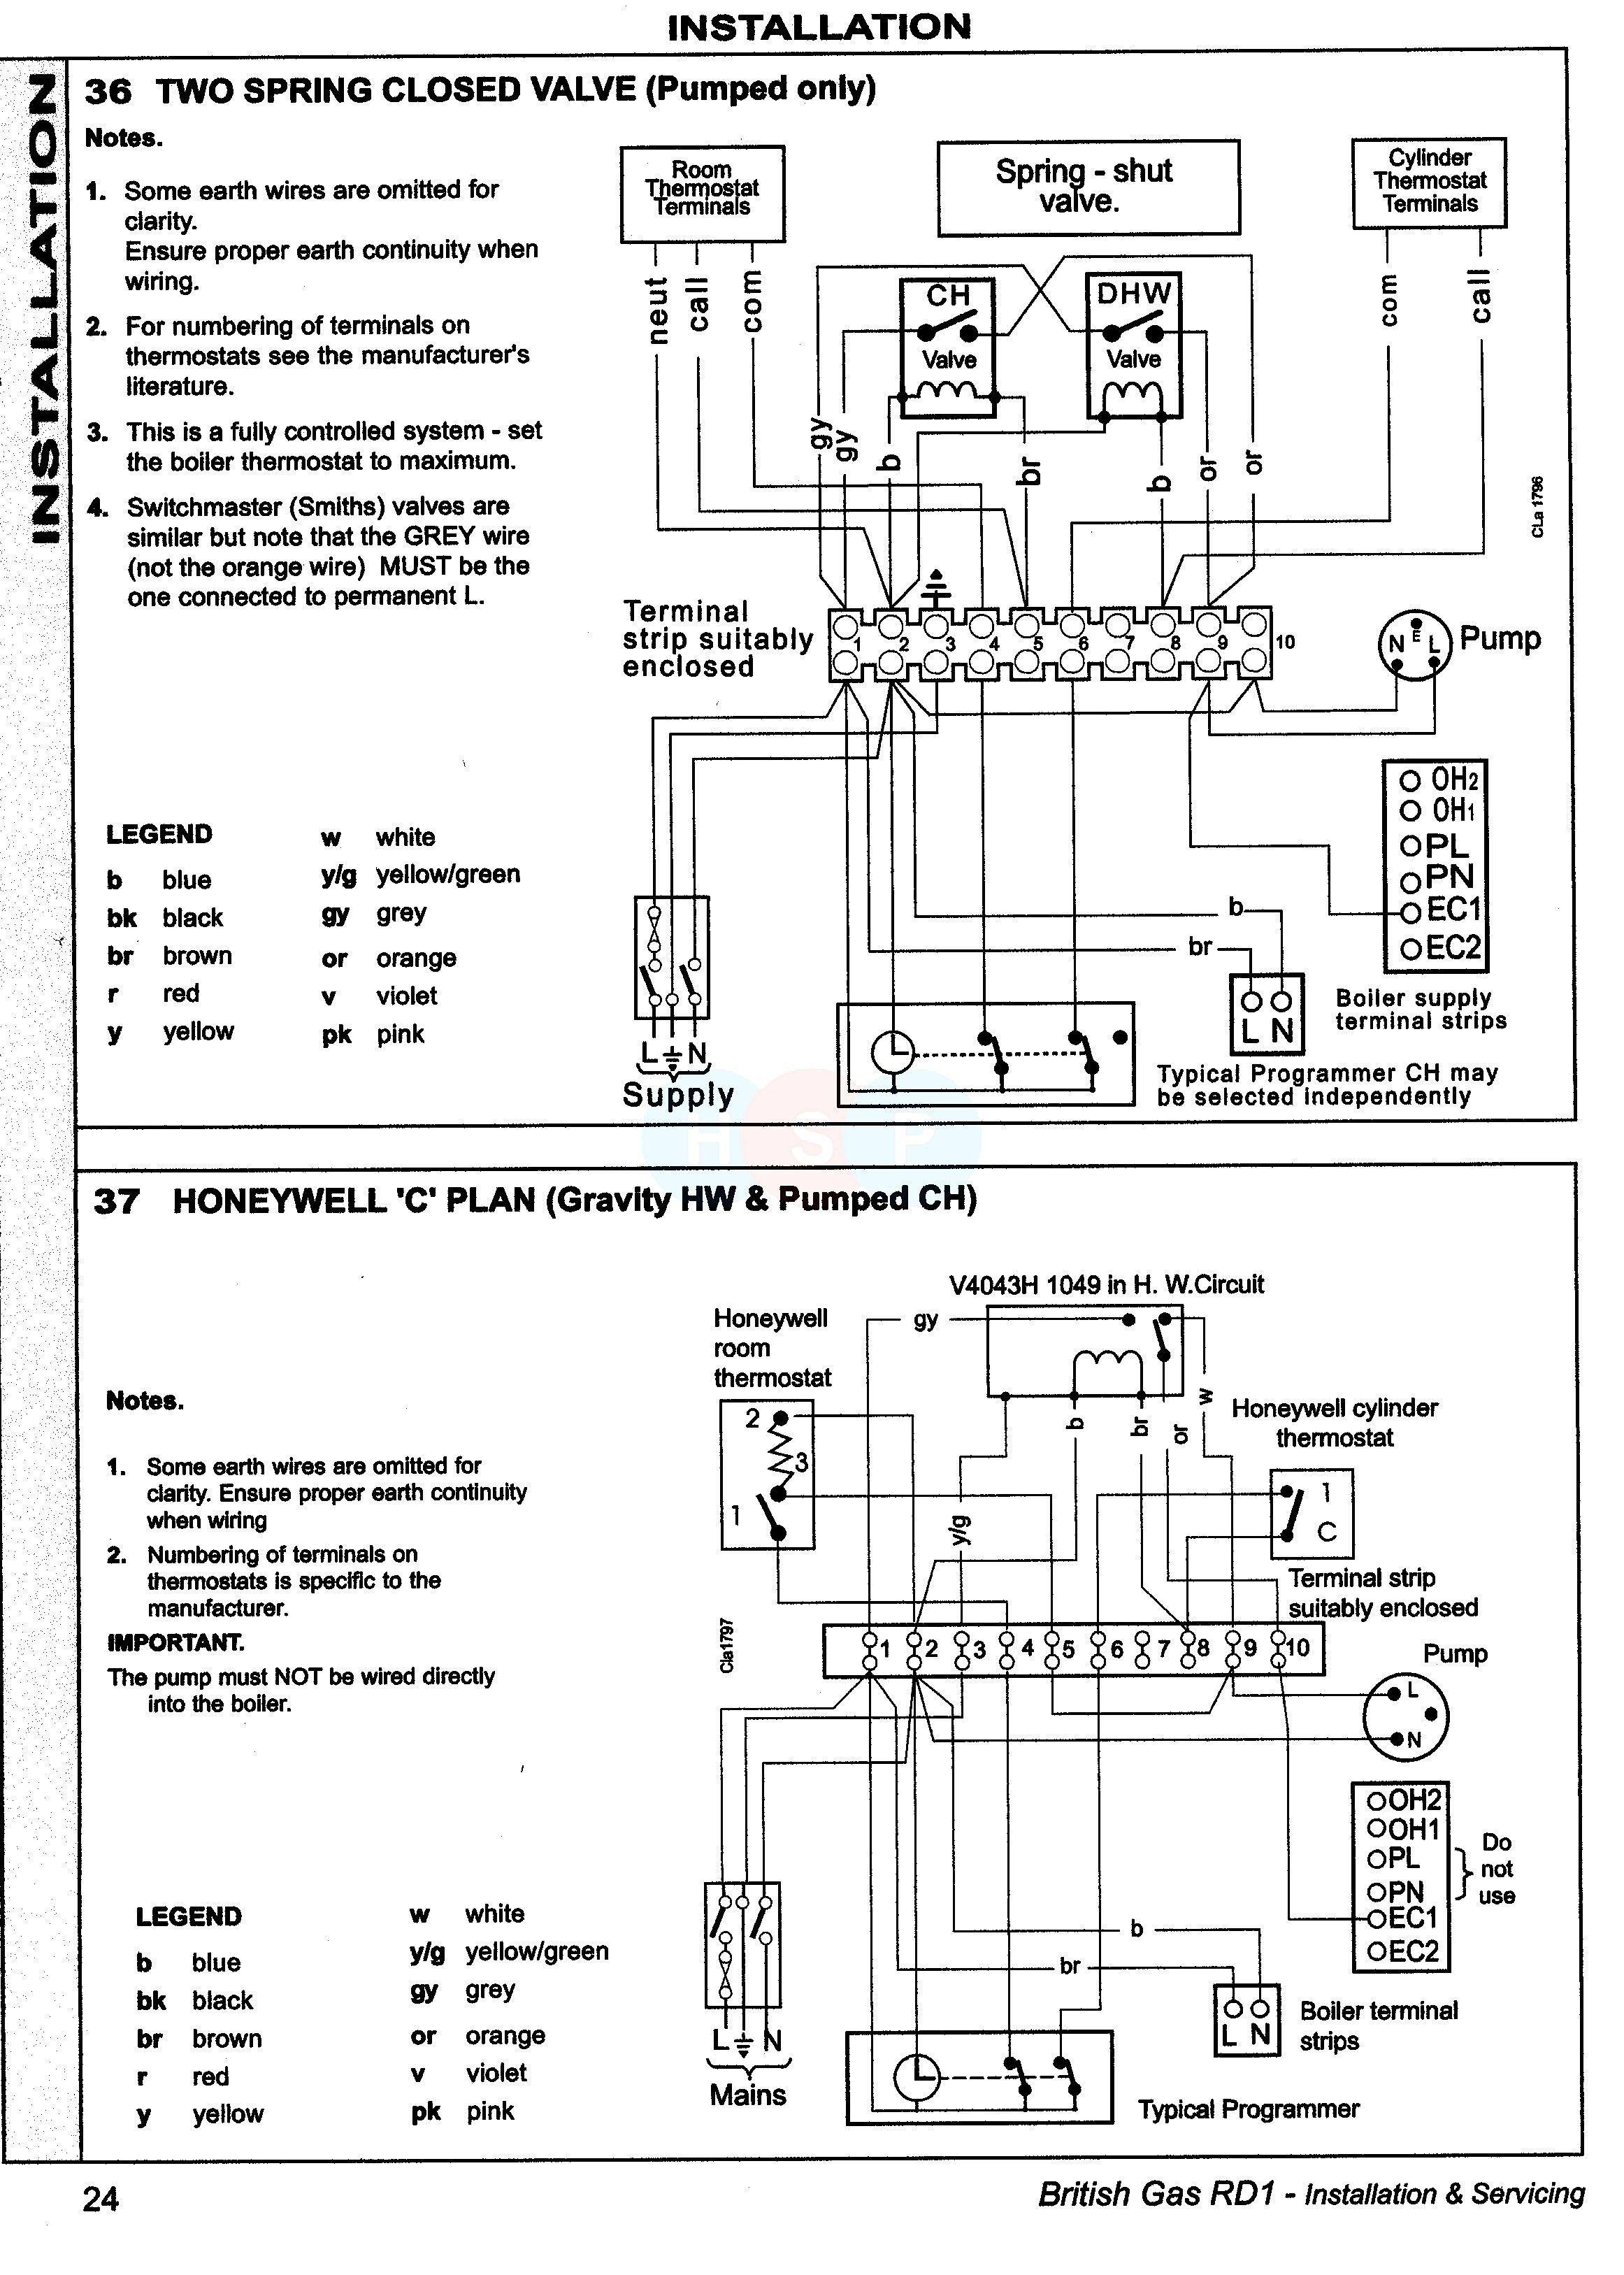 Coleman Mach Control Box Wiring Diagram